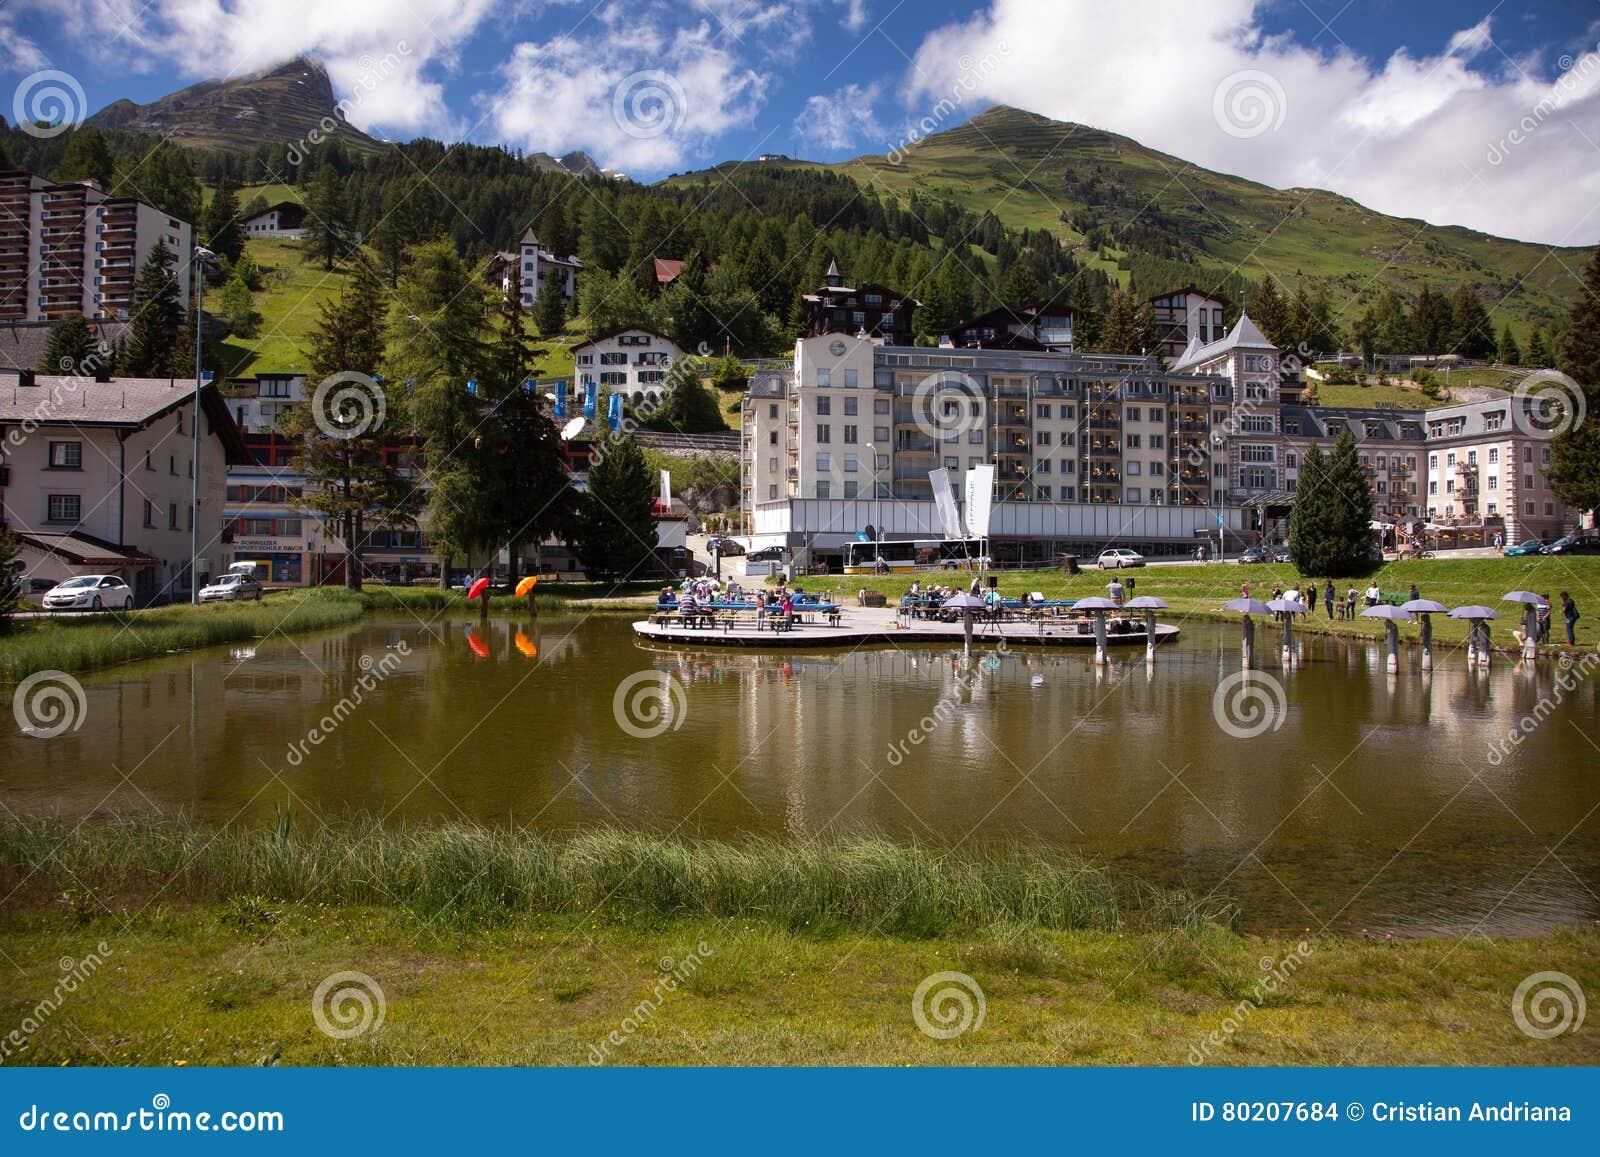 Красивое dowtown Давос видов на город, Швейцария